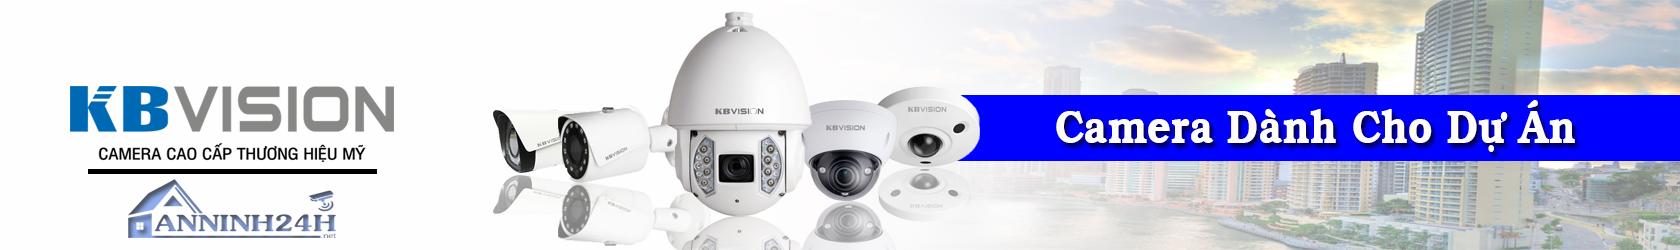 camera kbvission